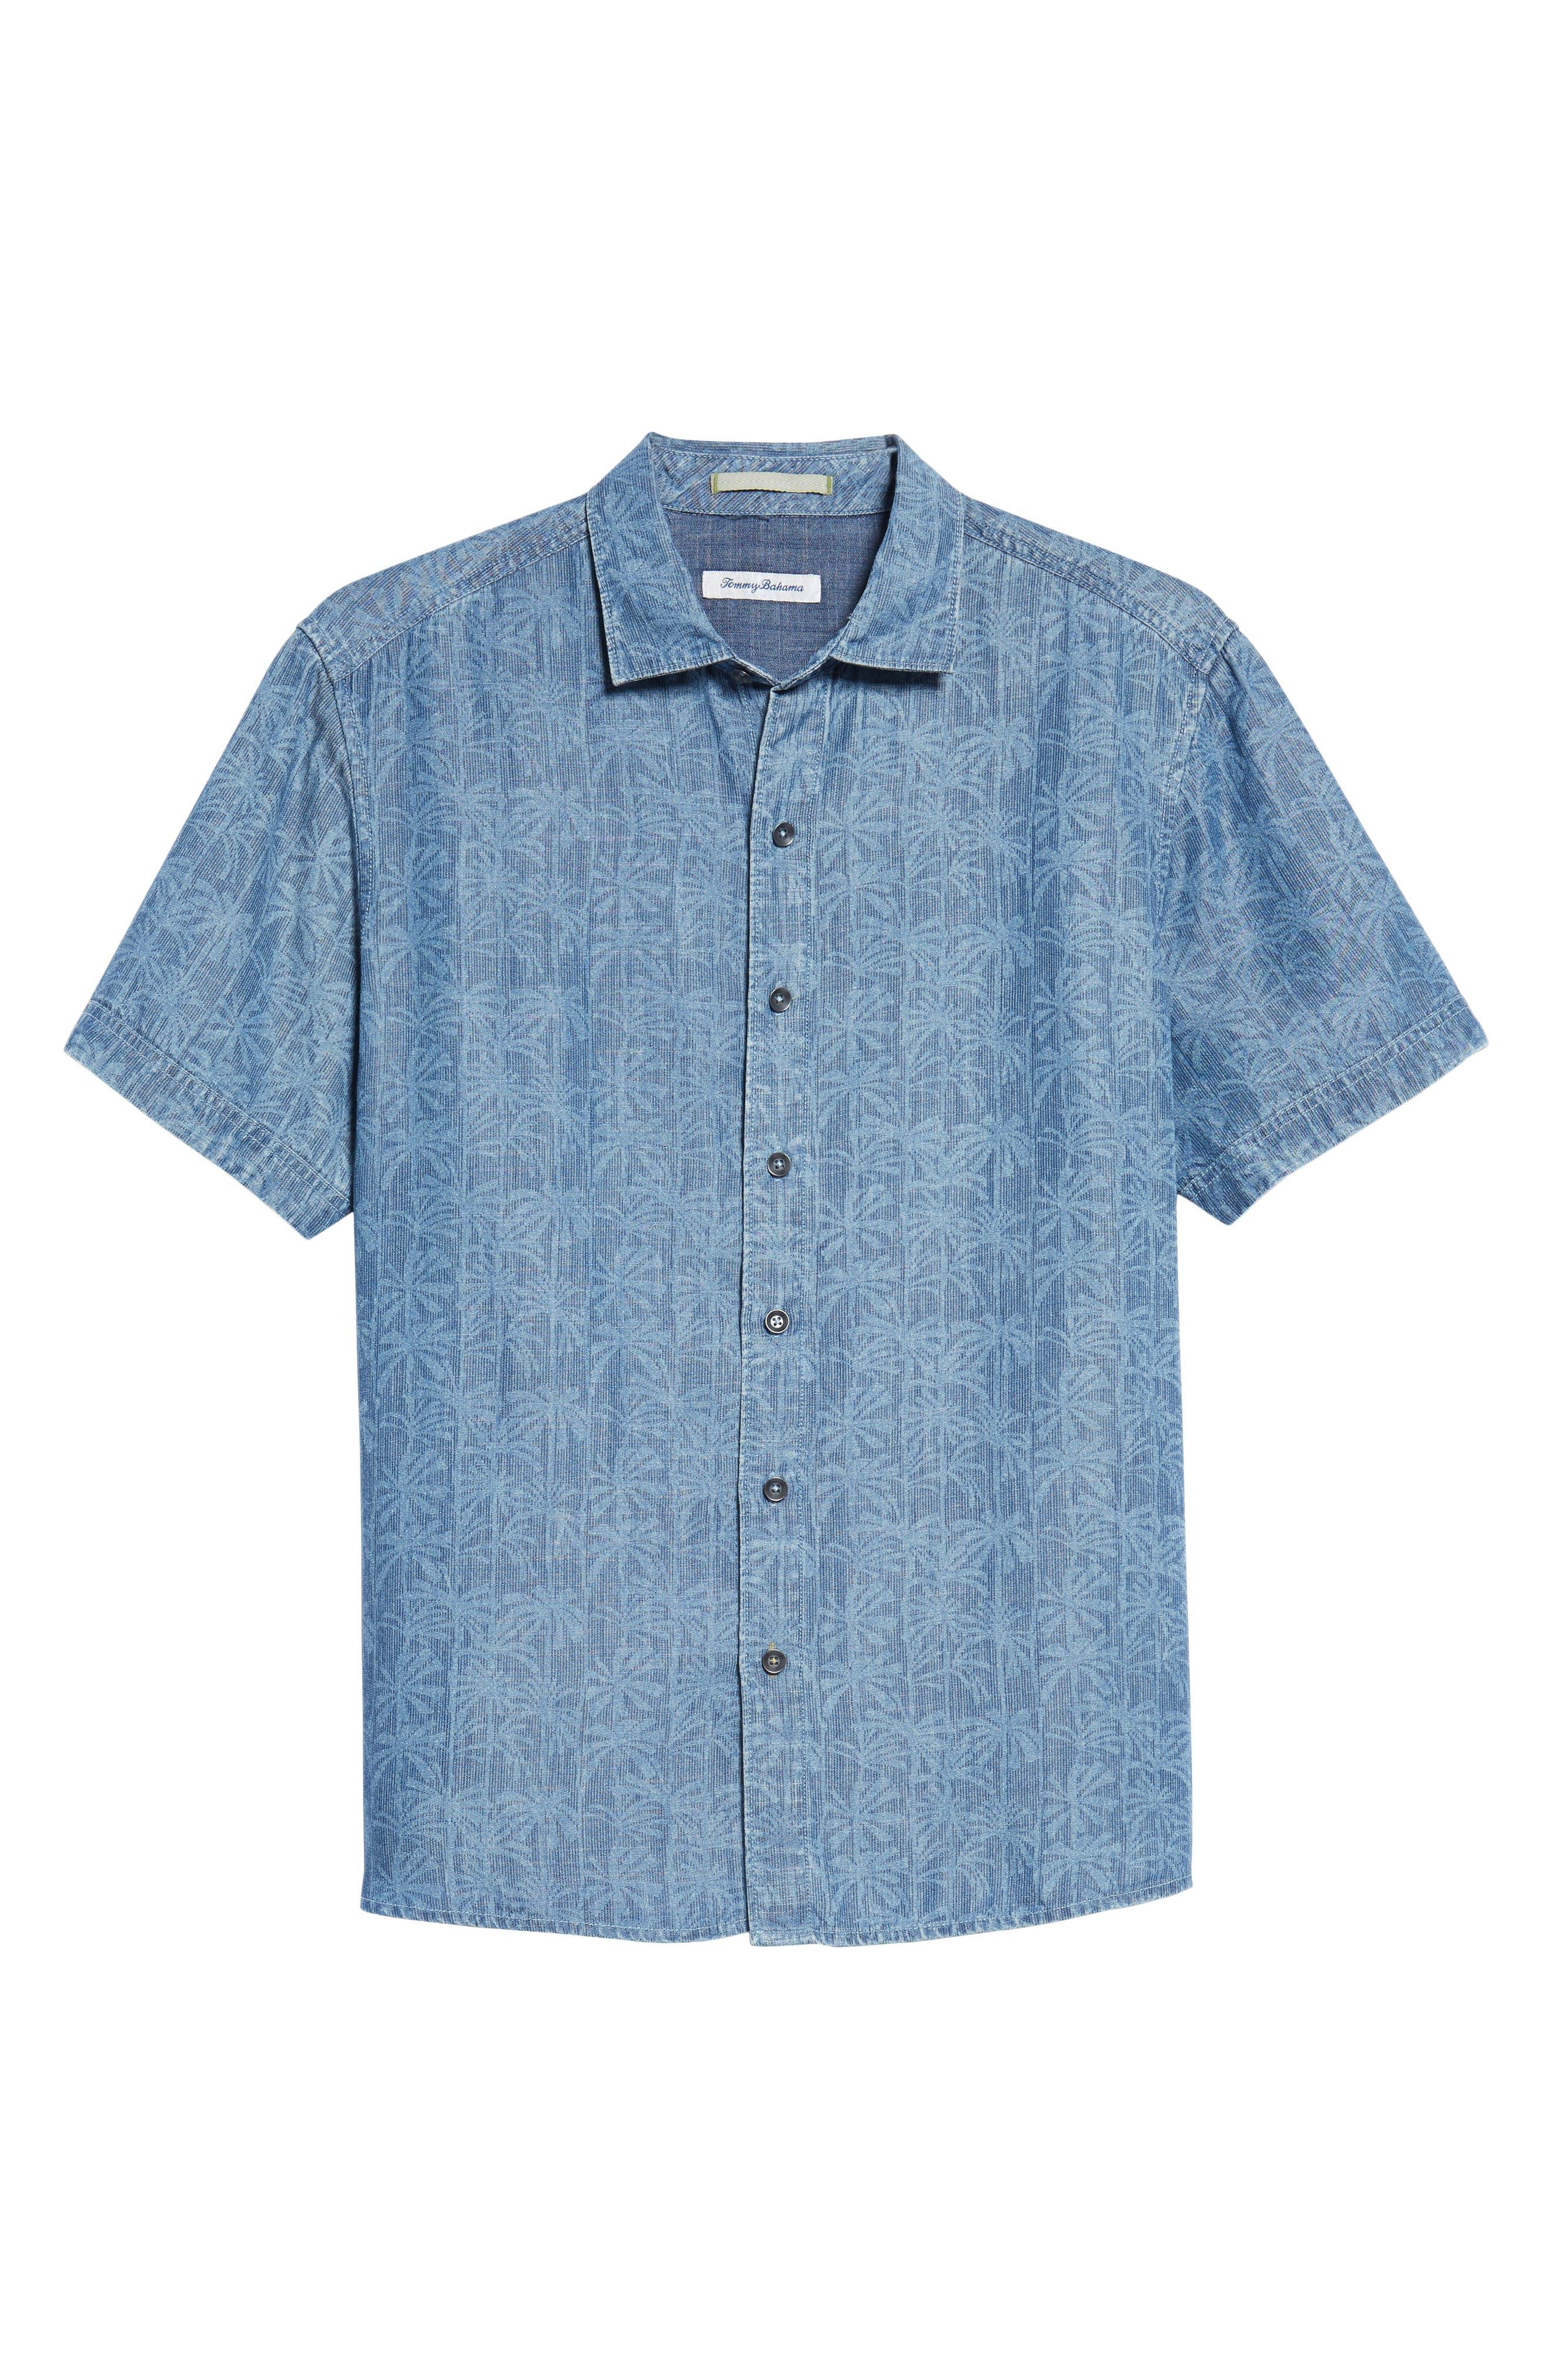 Block Party Palms Chambray Sport Shirt,                             Alternate thumbnail 6, color,                             Light Indigo